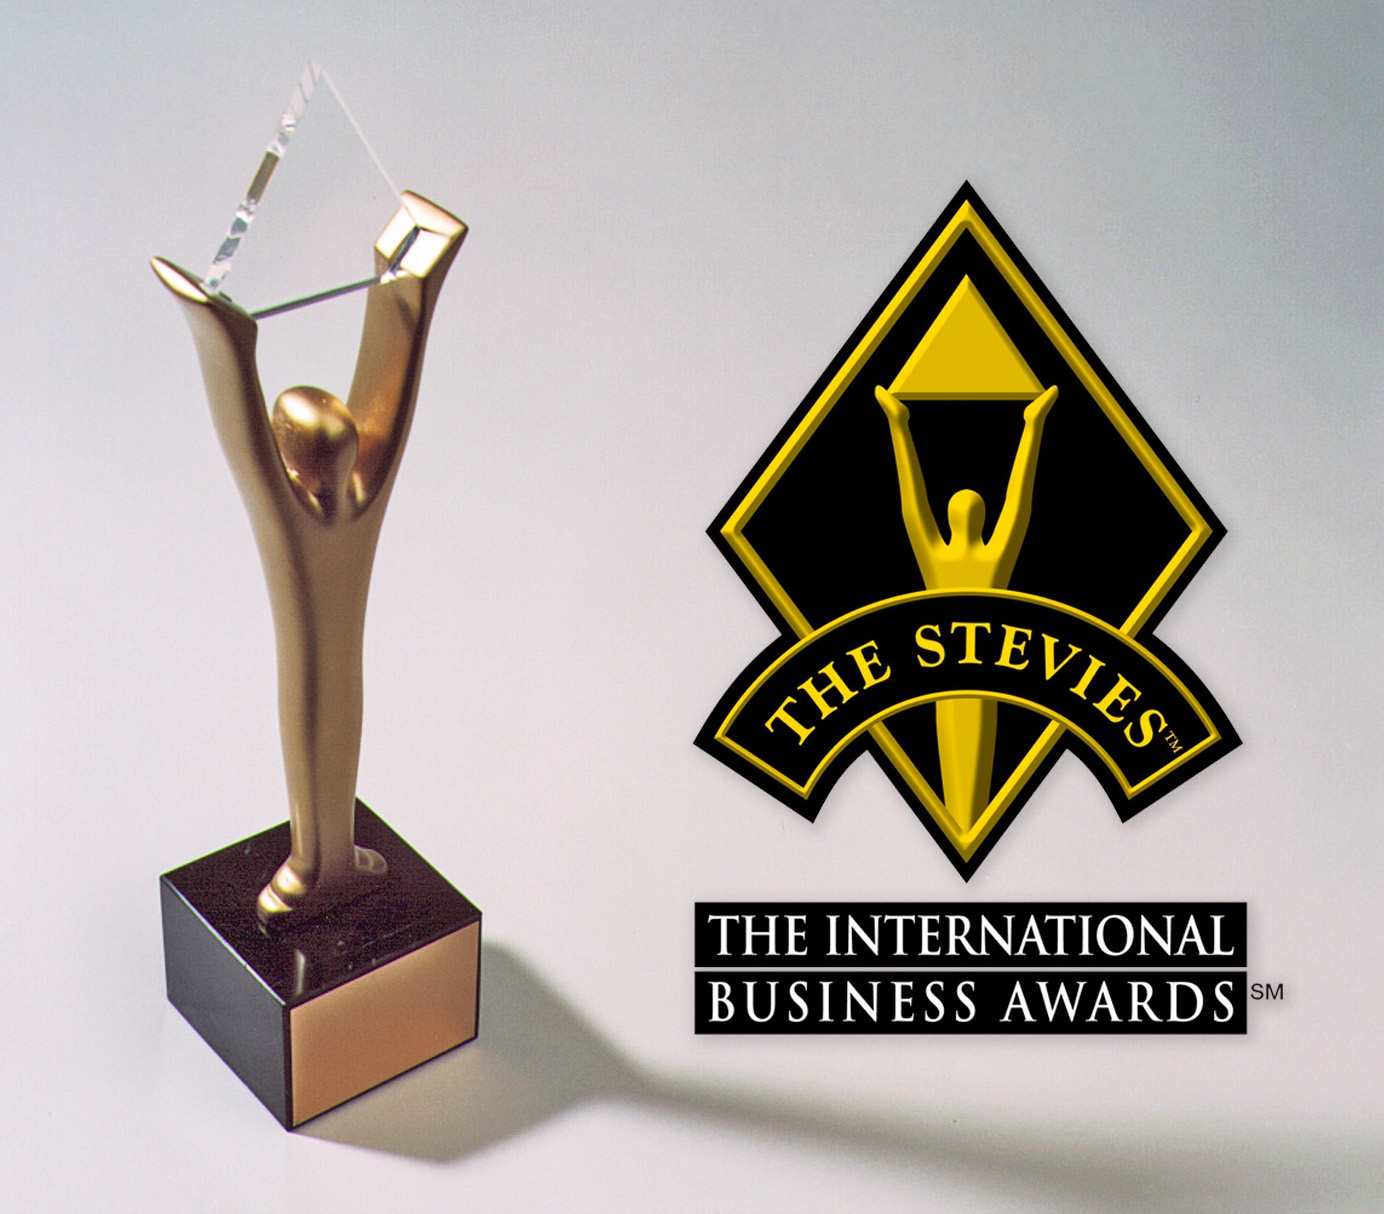 mabl Wins 2018 International Business Award